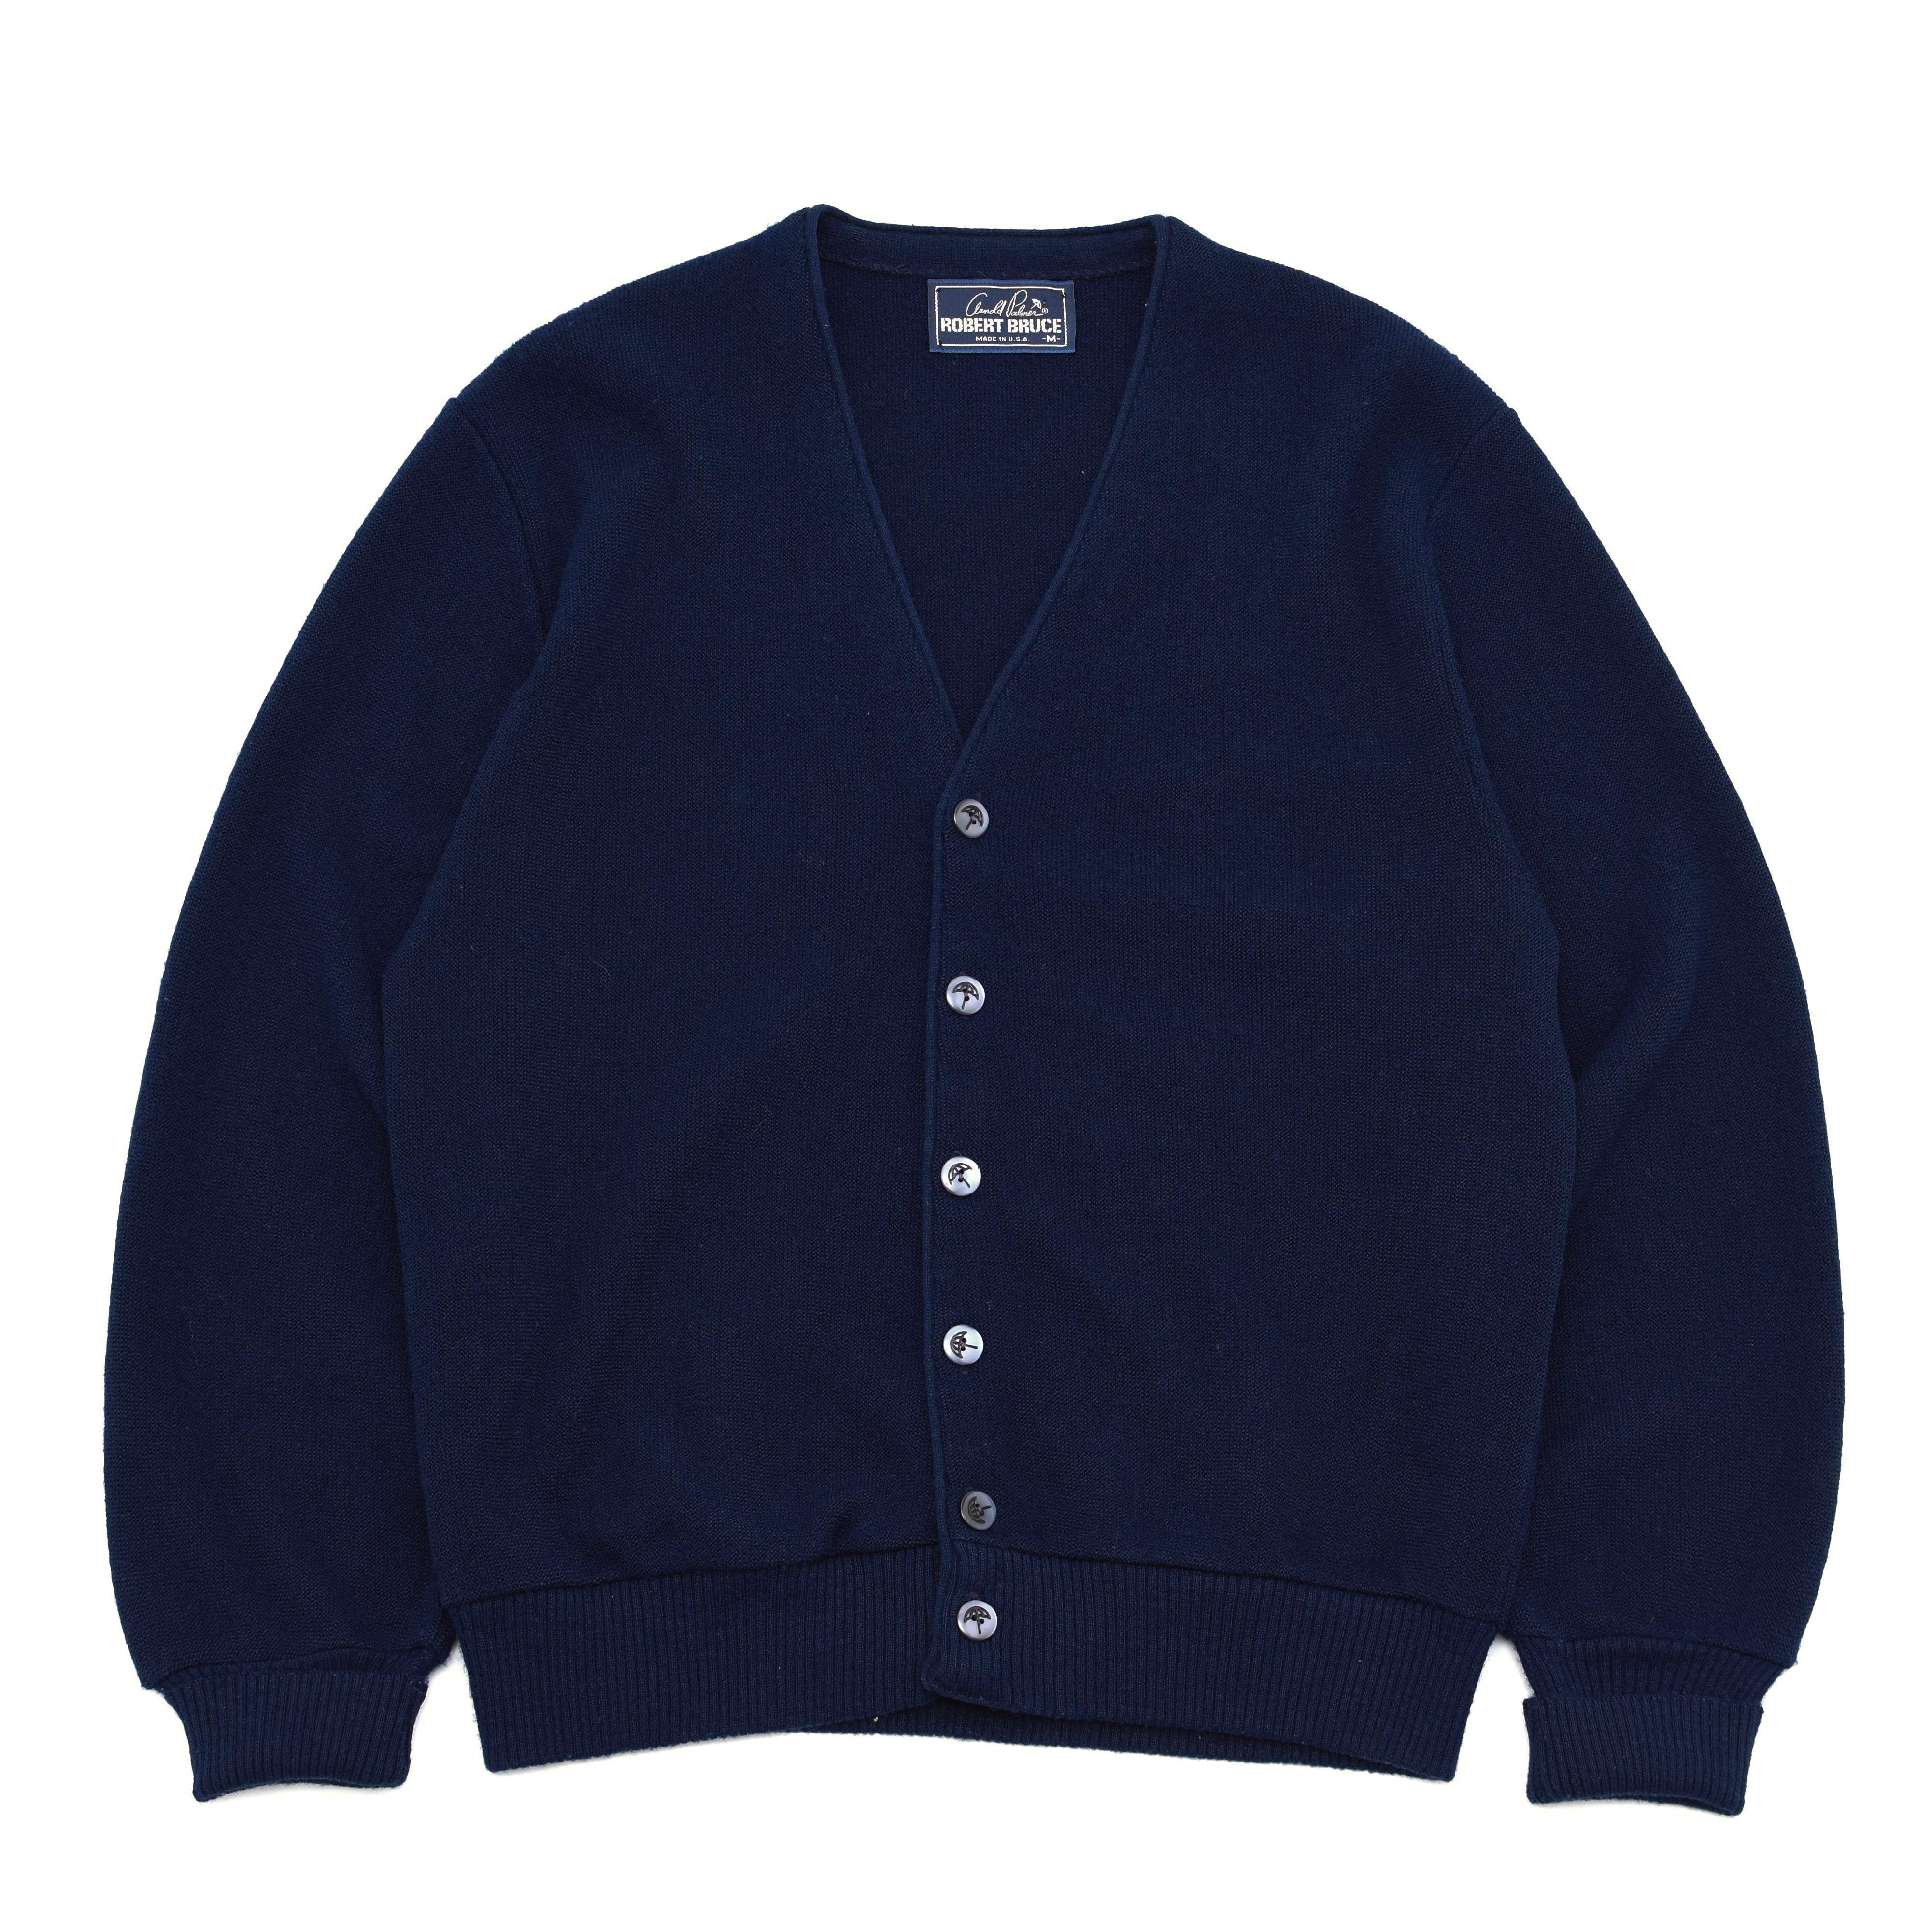 Made in USA Arnold Palmer knit cardigan